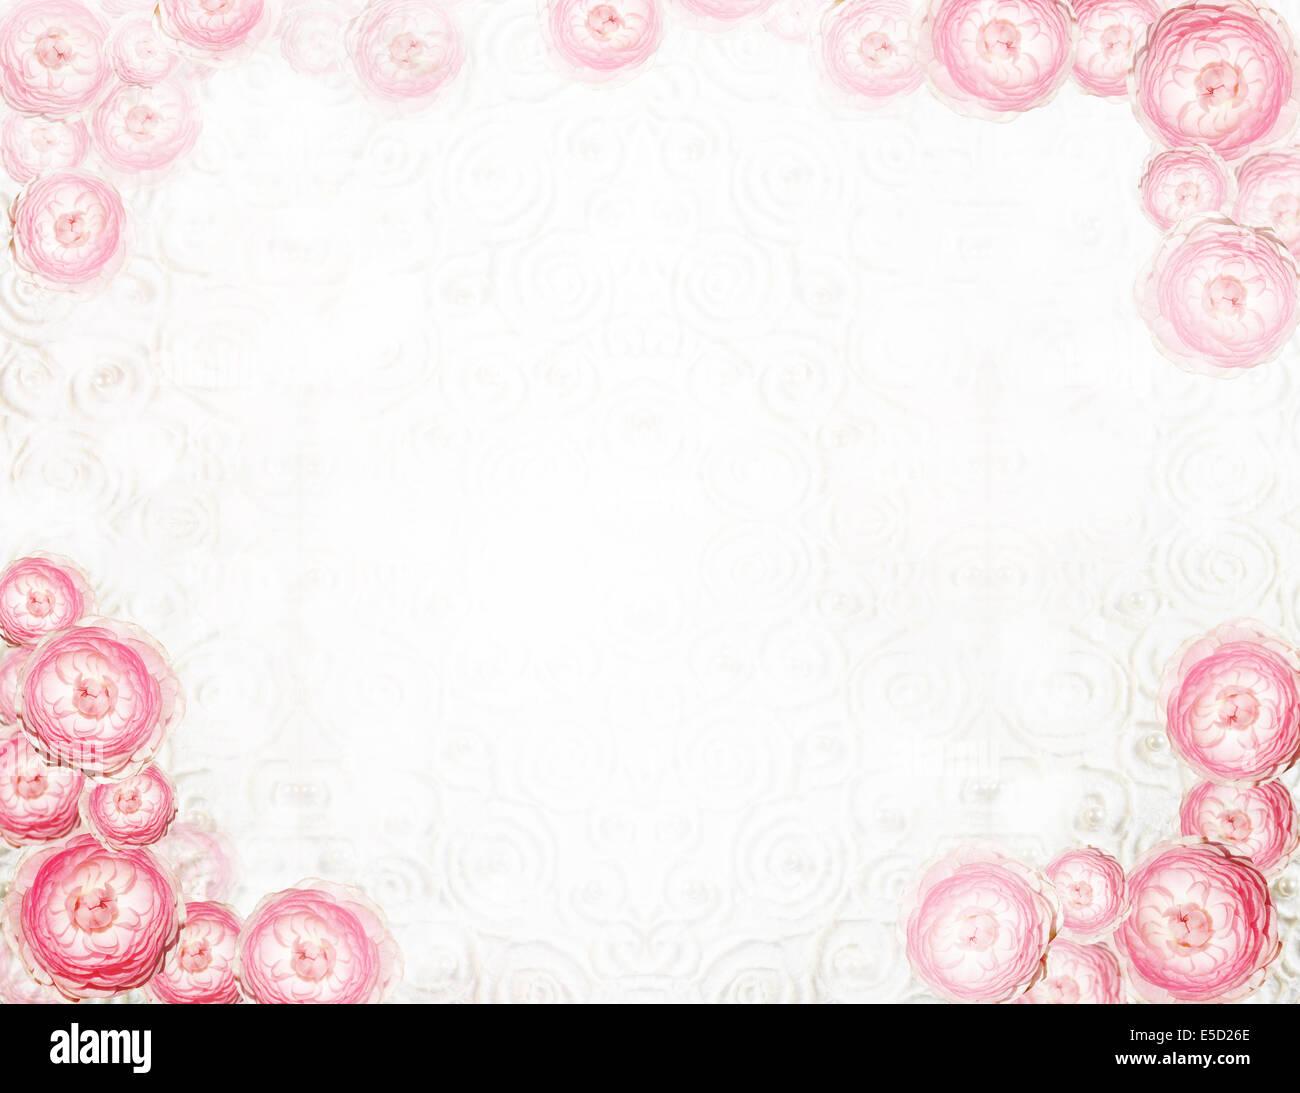 Anordnung. Abstrakte festliche Blumenkarte Stockbild